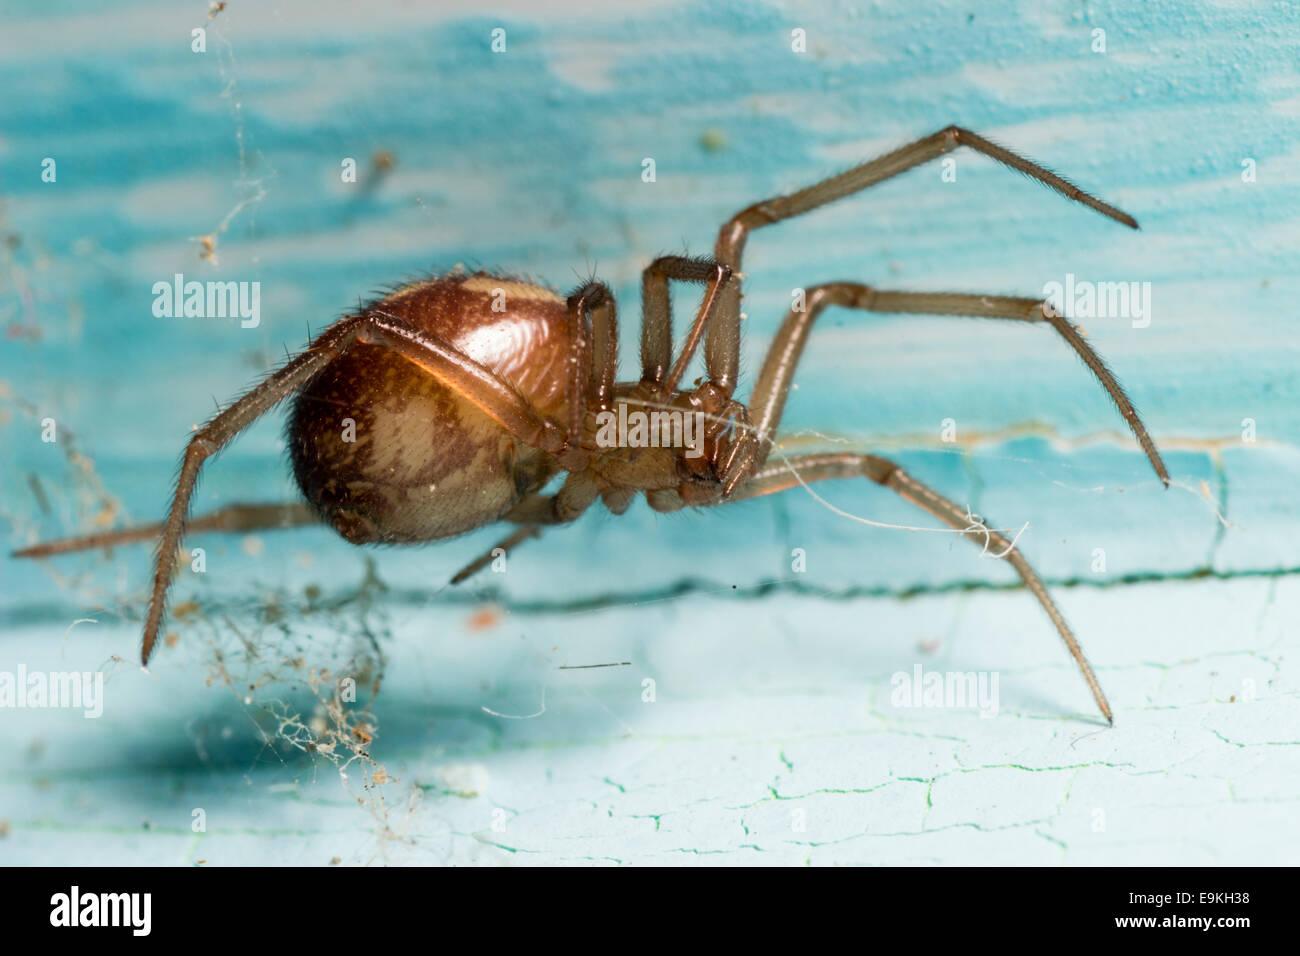 false-widow-spider-steatoda-nobilis-on-cracked-old-paintwork-E9KH38.jpg